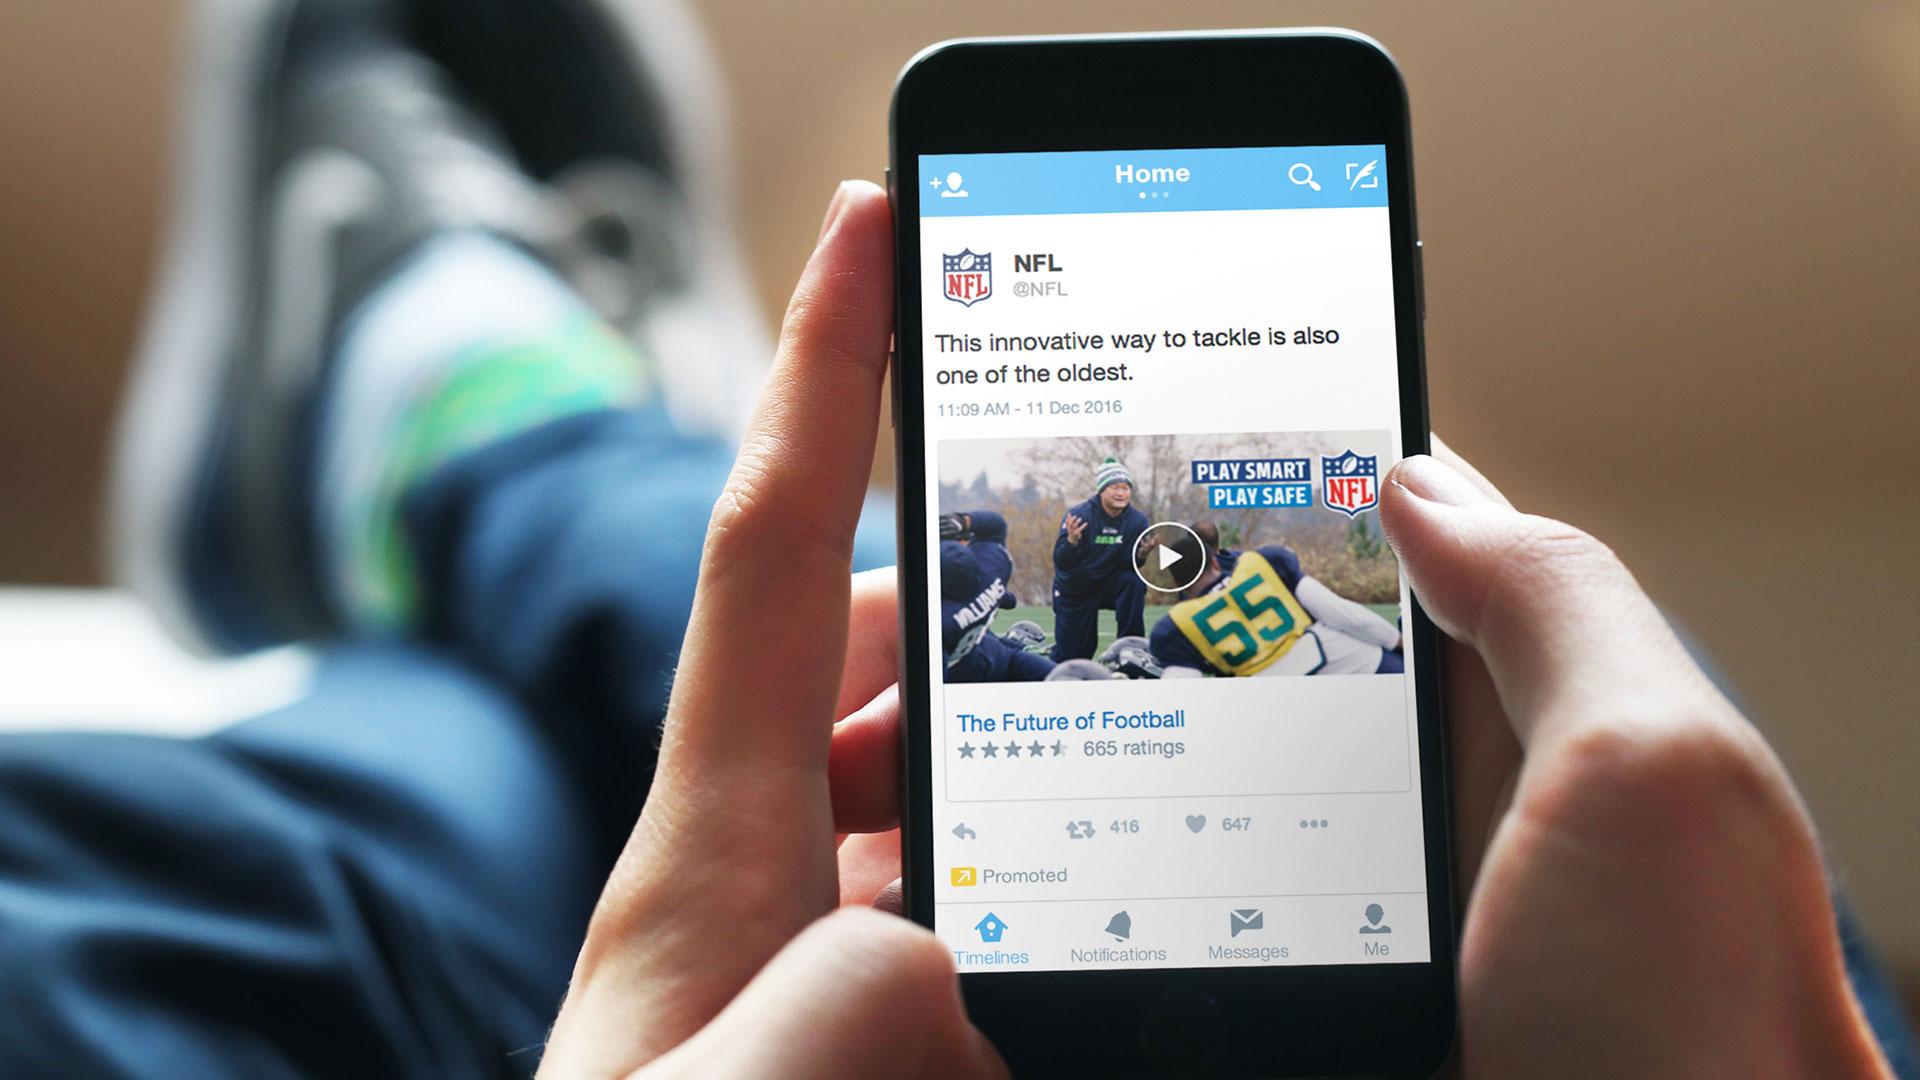 _NFL_FoF_Seattle_tweet.jpg